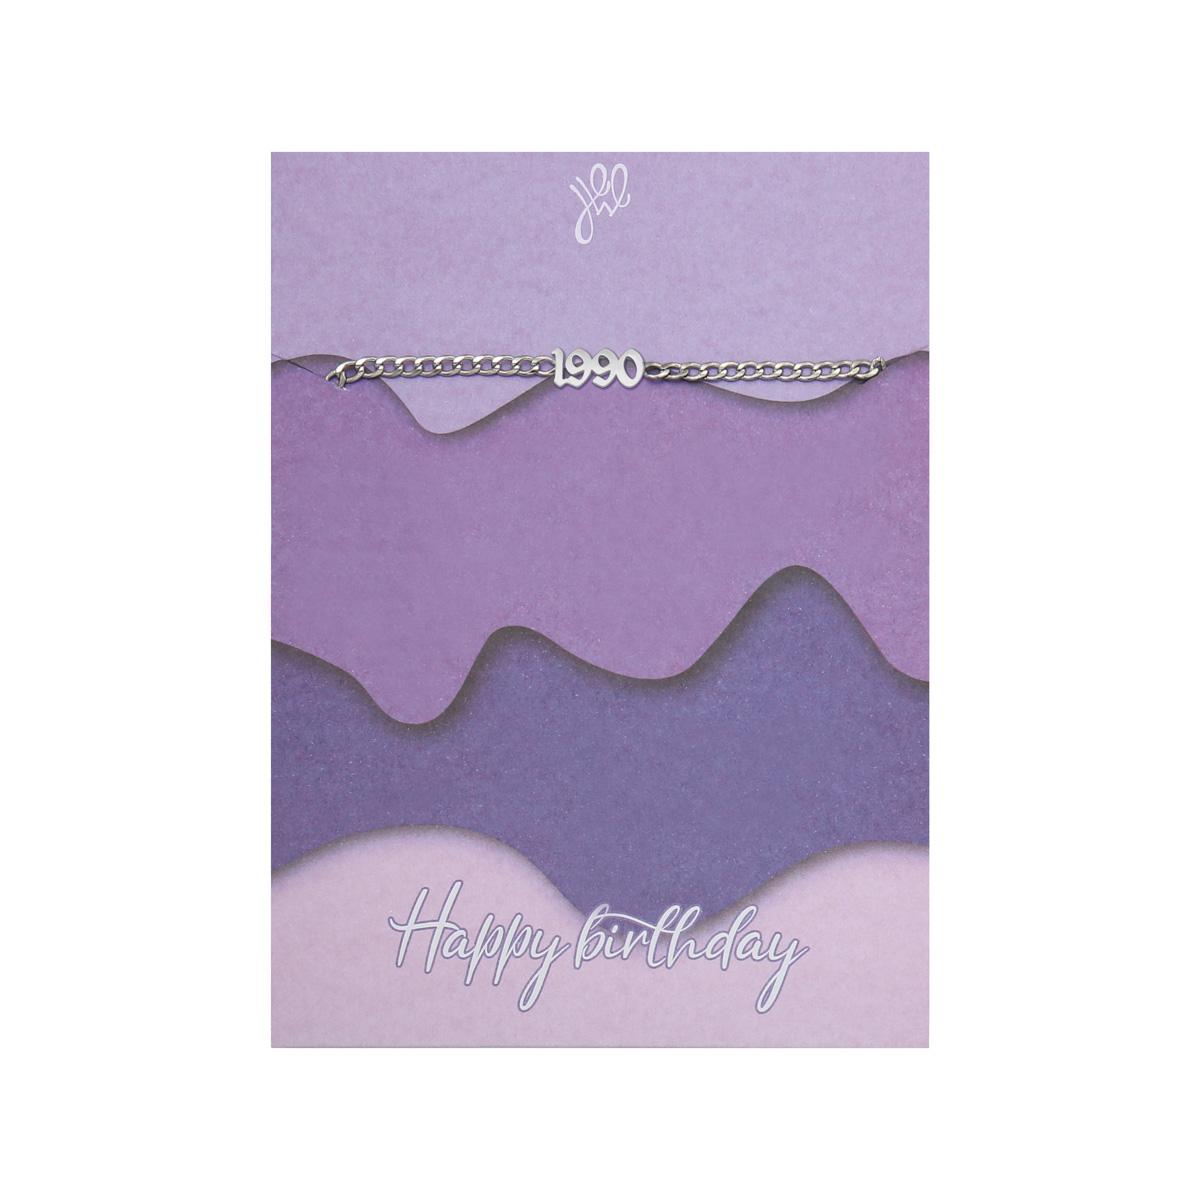 Bracelet Happy Birthday Years- 2000